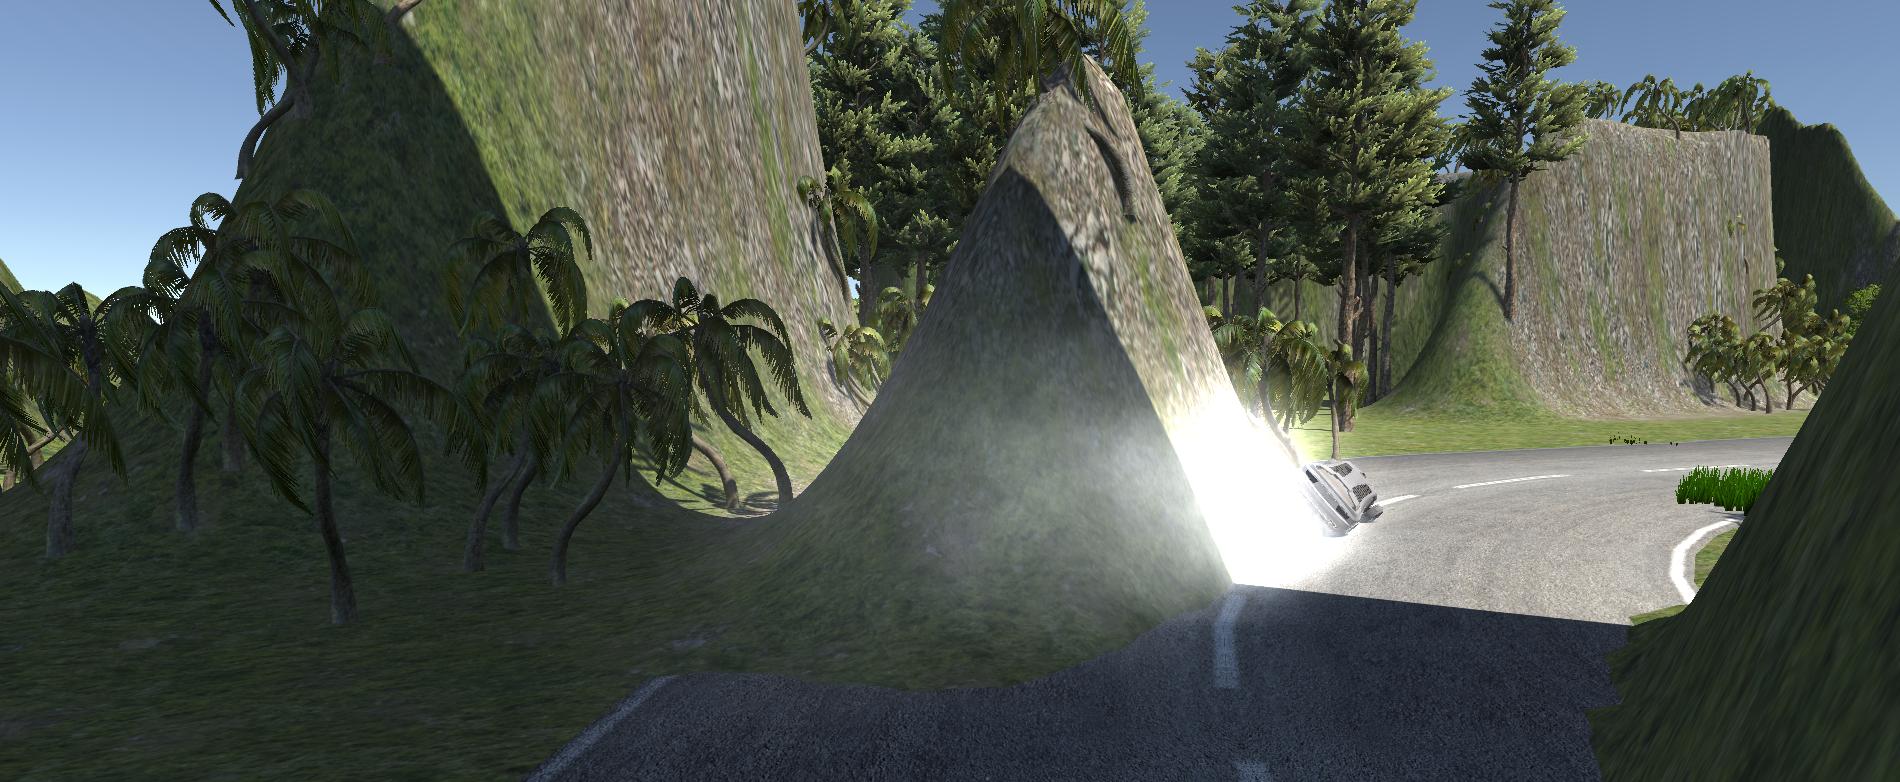 Terrain Course